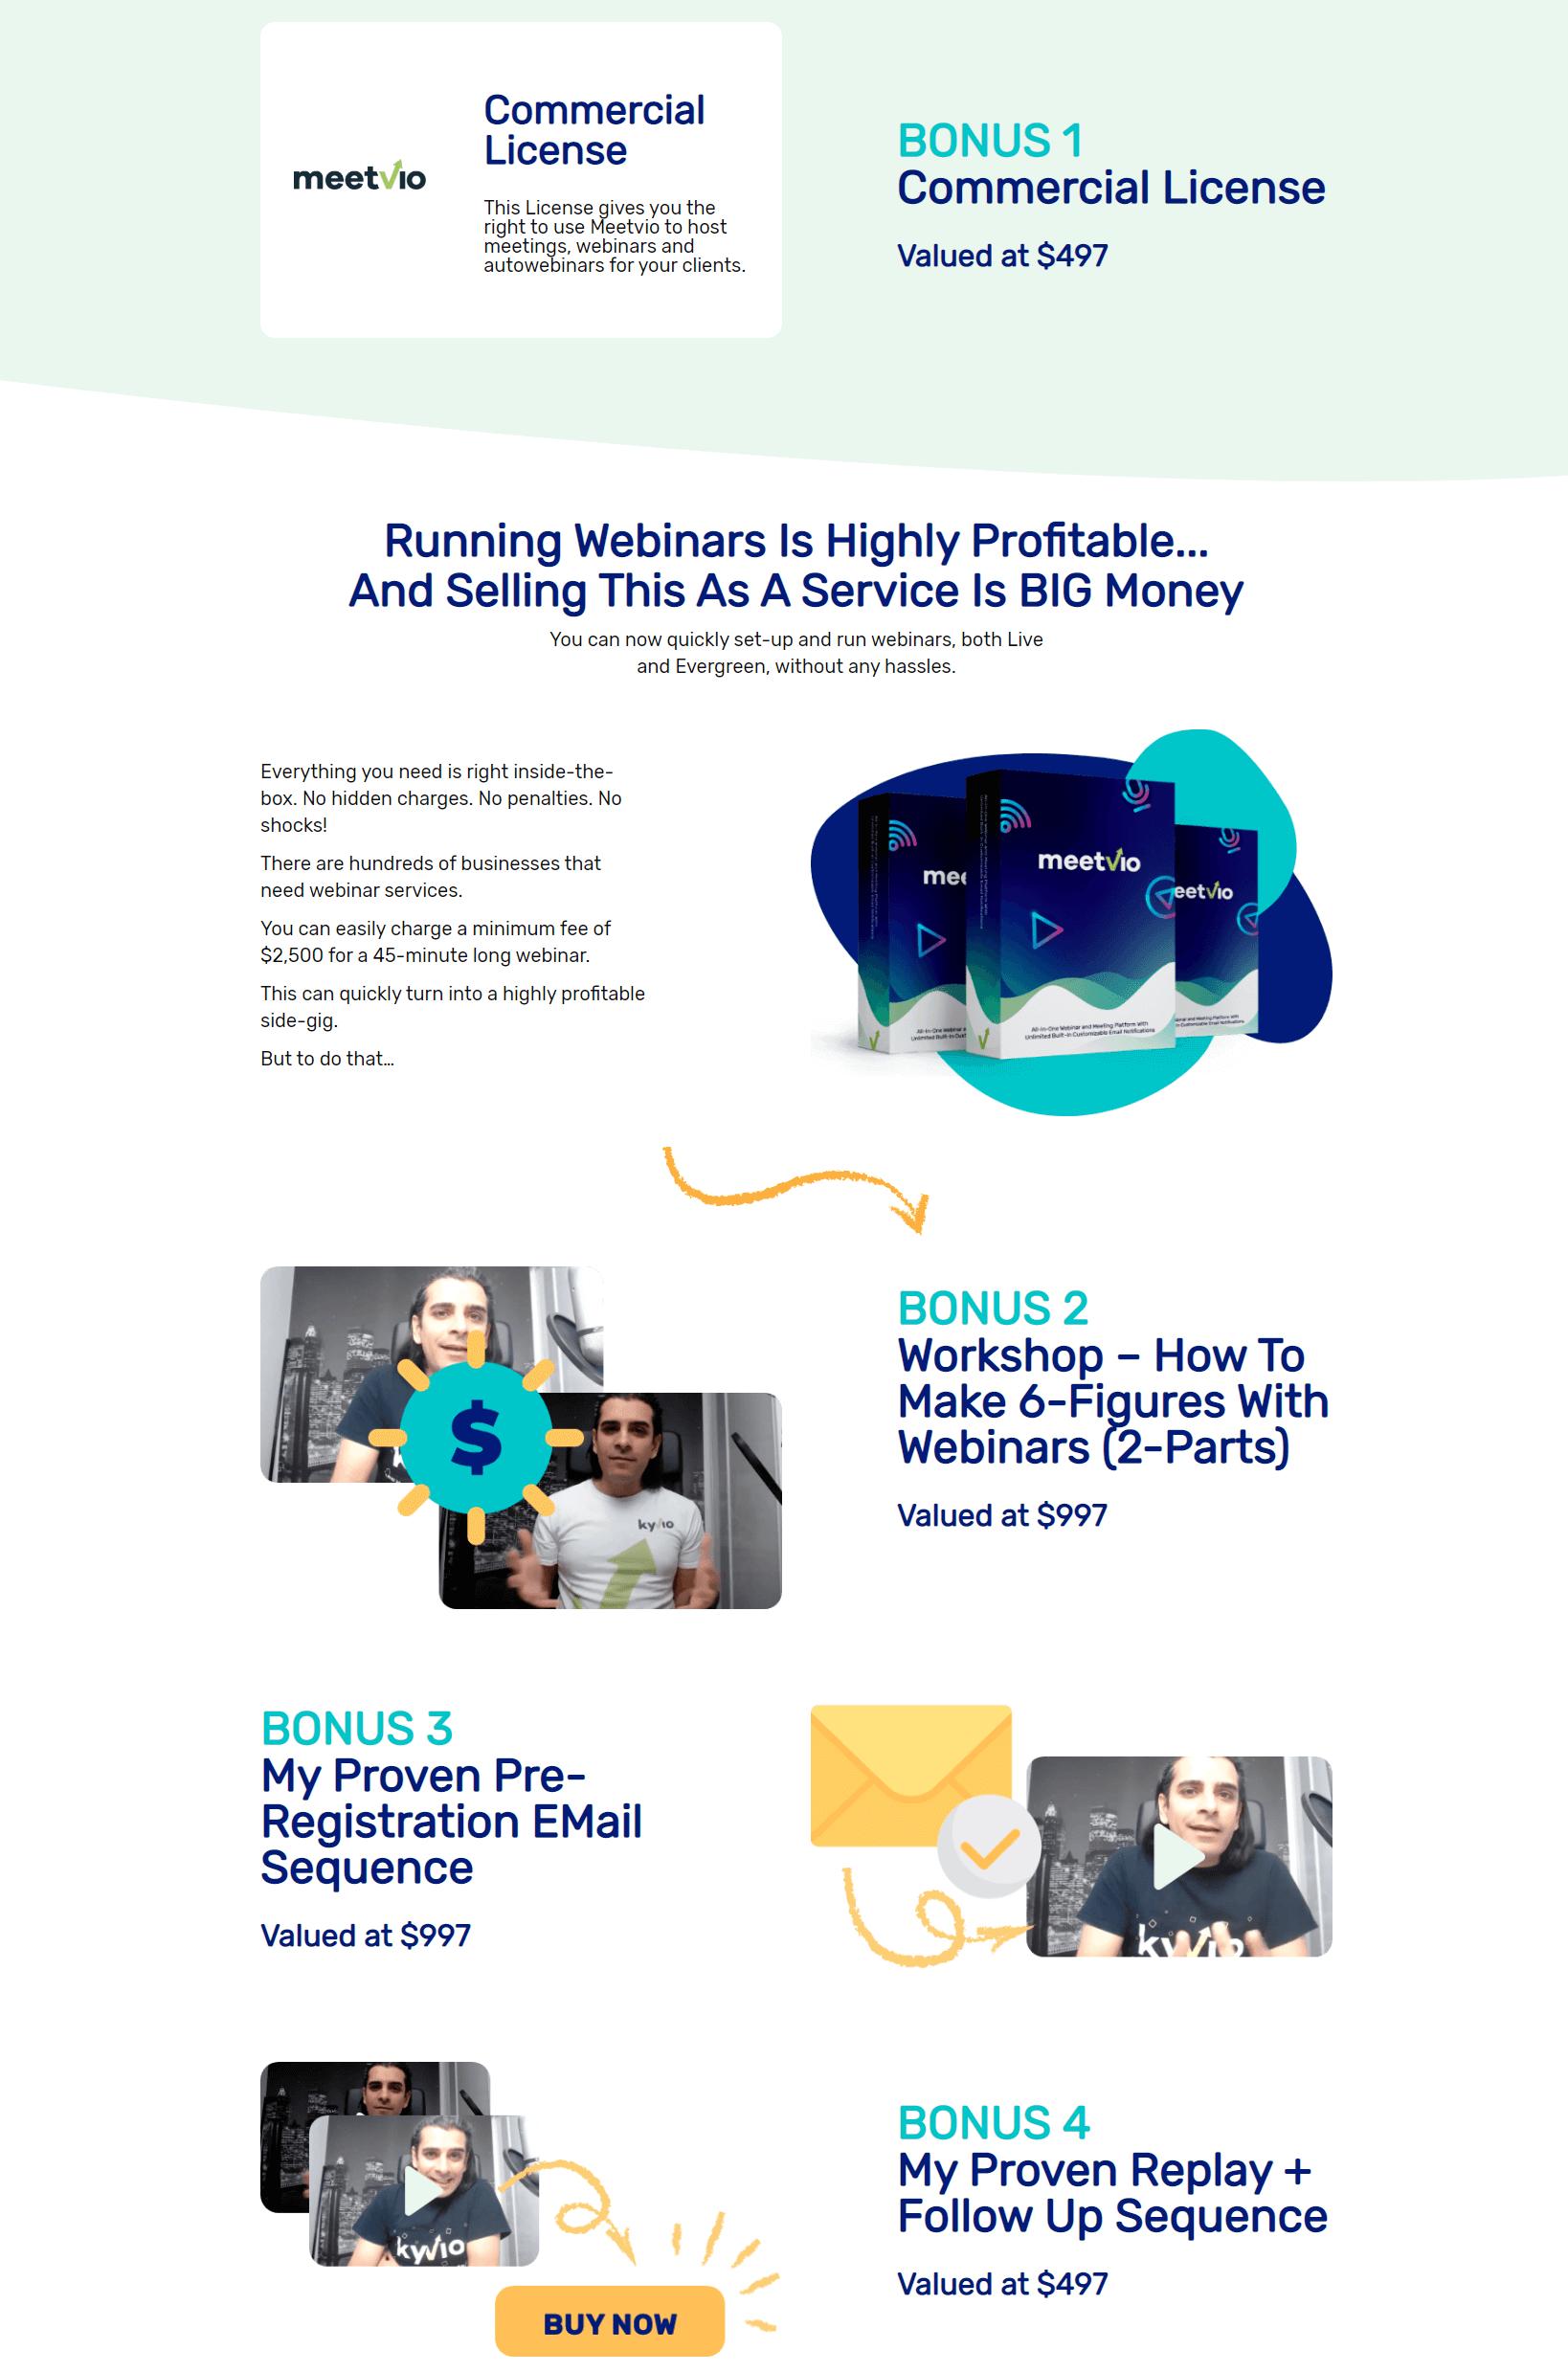 Meetvio-Review-Bonuses